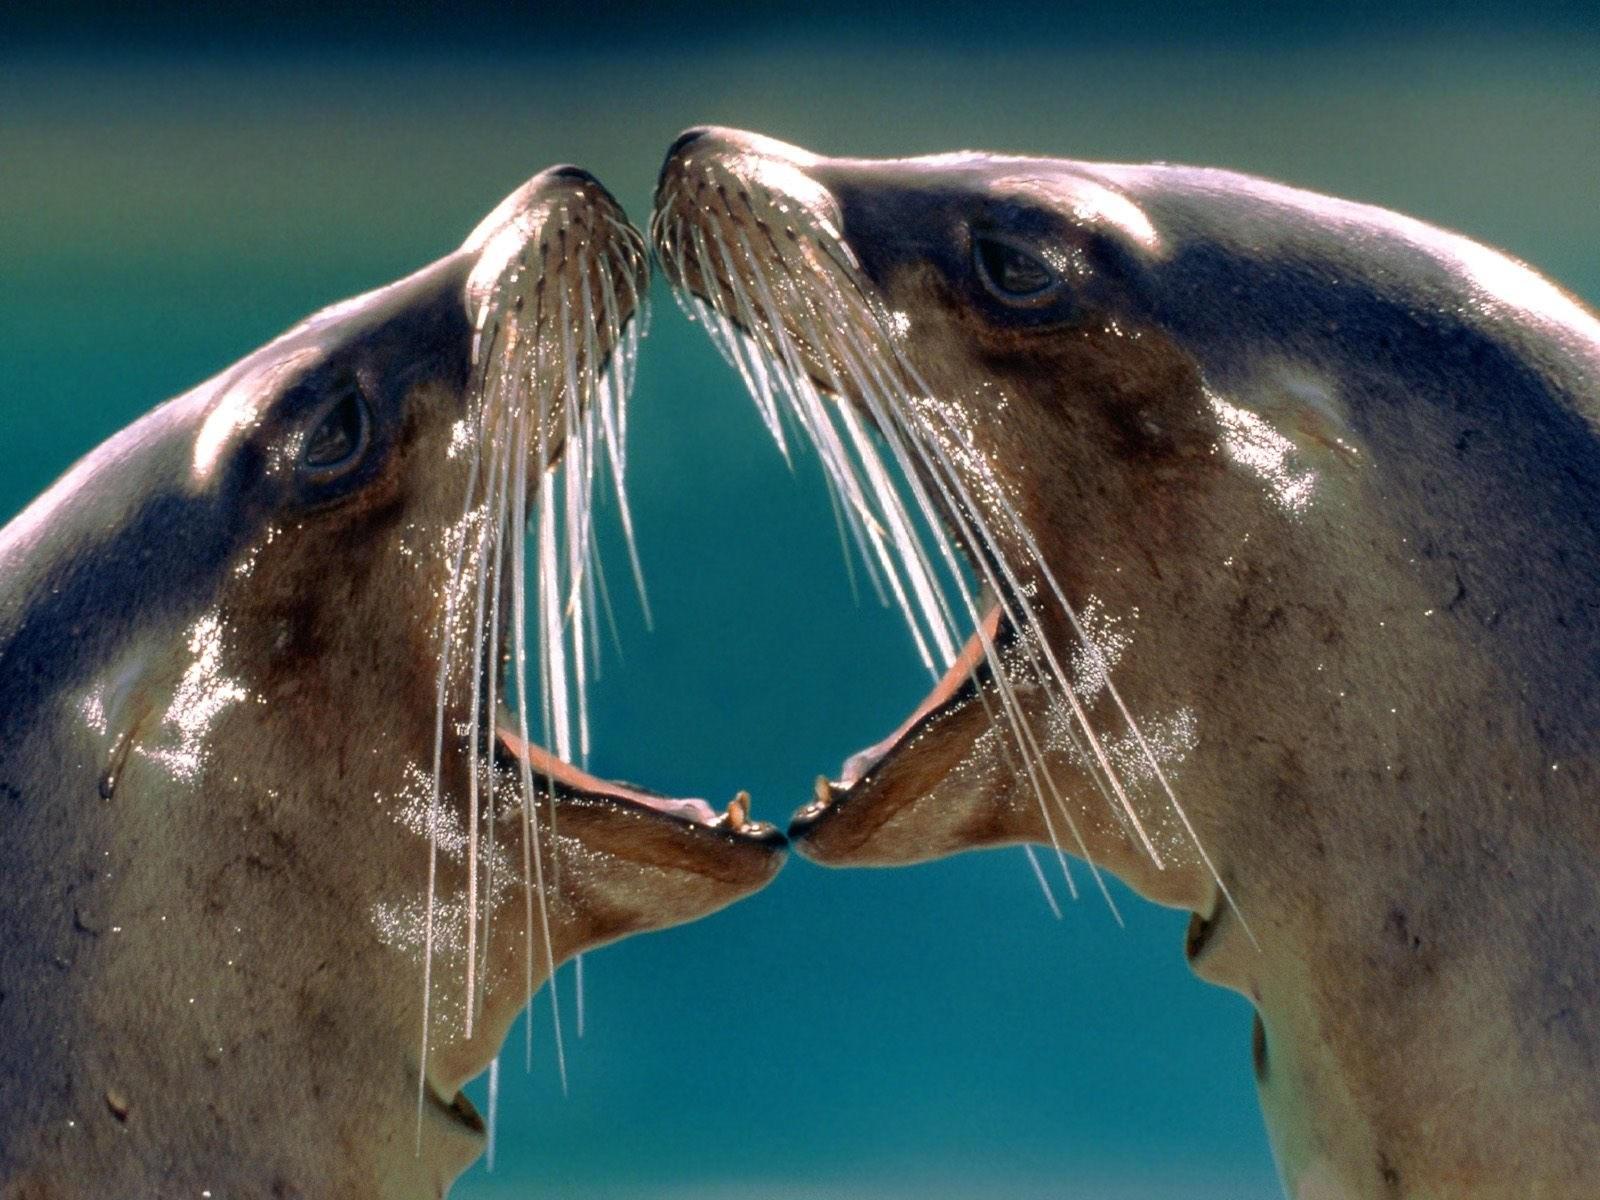 Два морских котика с открытыми пастями